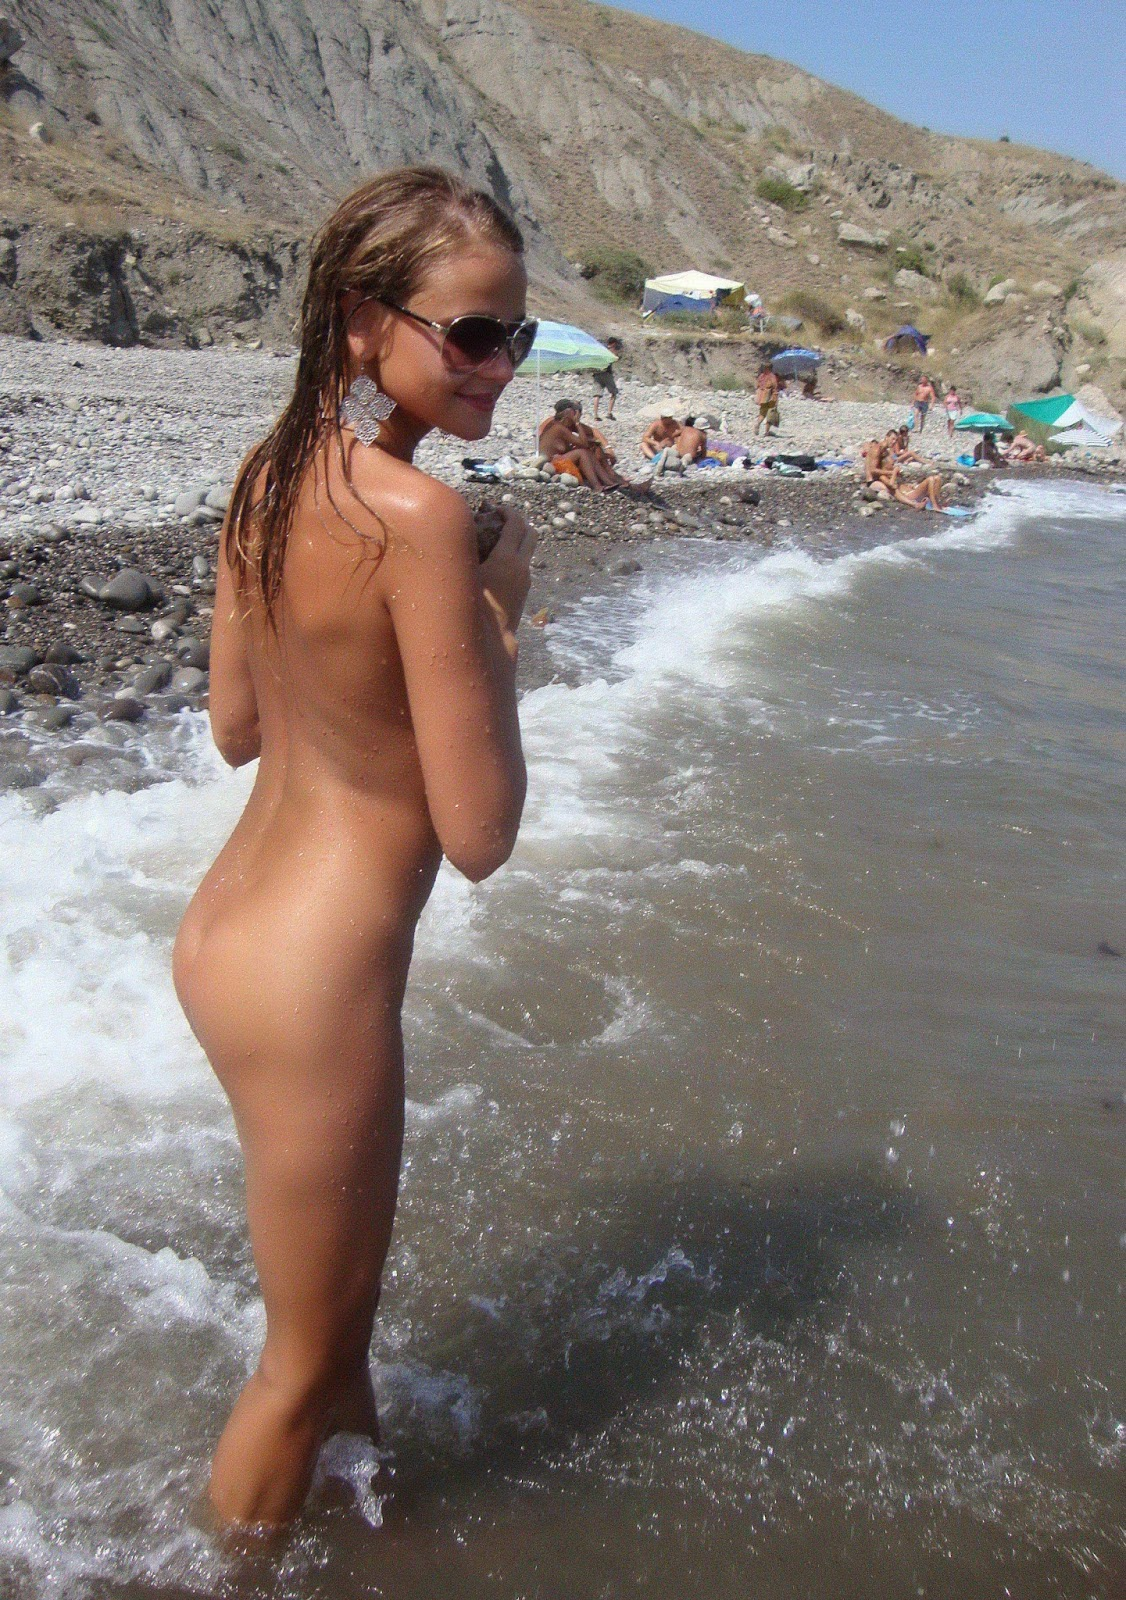 jp nudism Amateur young girls - nude beach - MIX (2014)